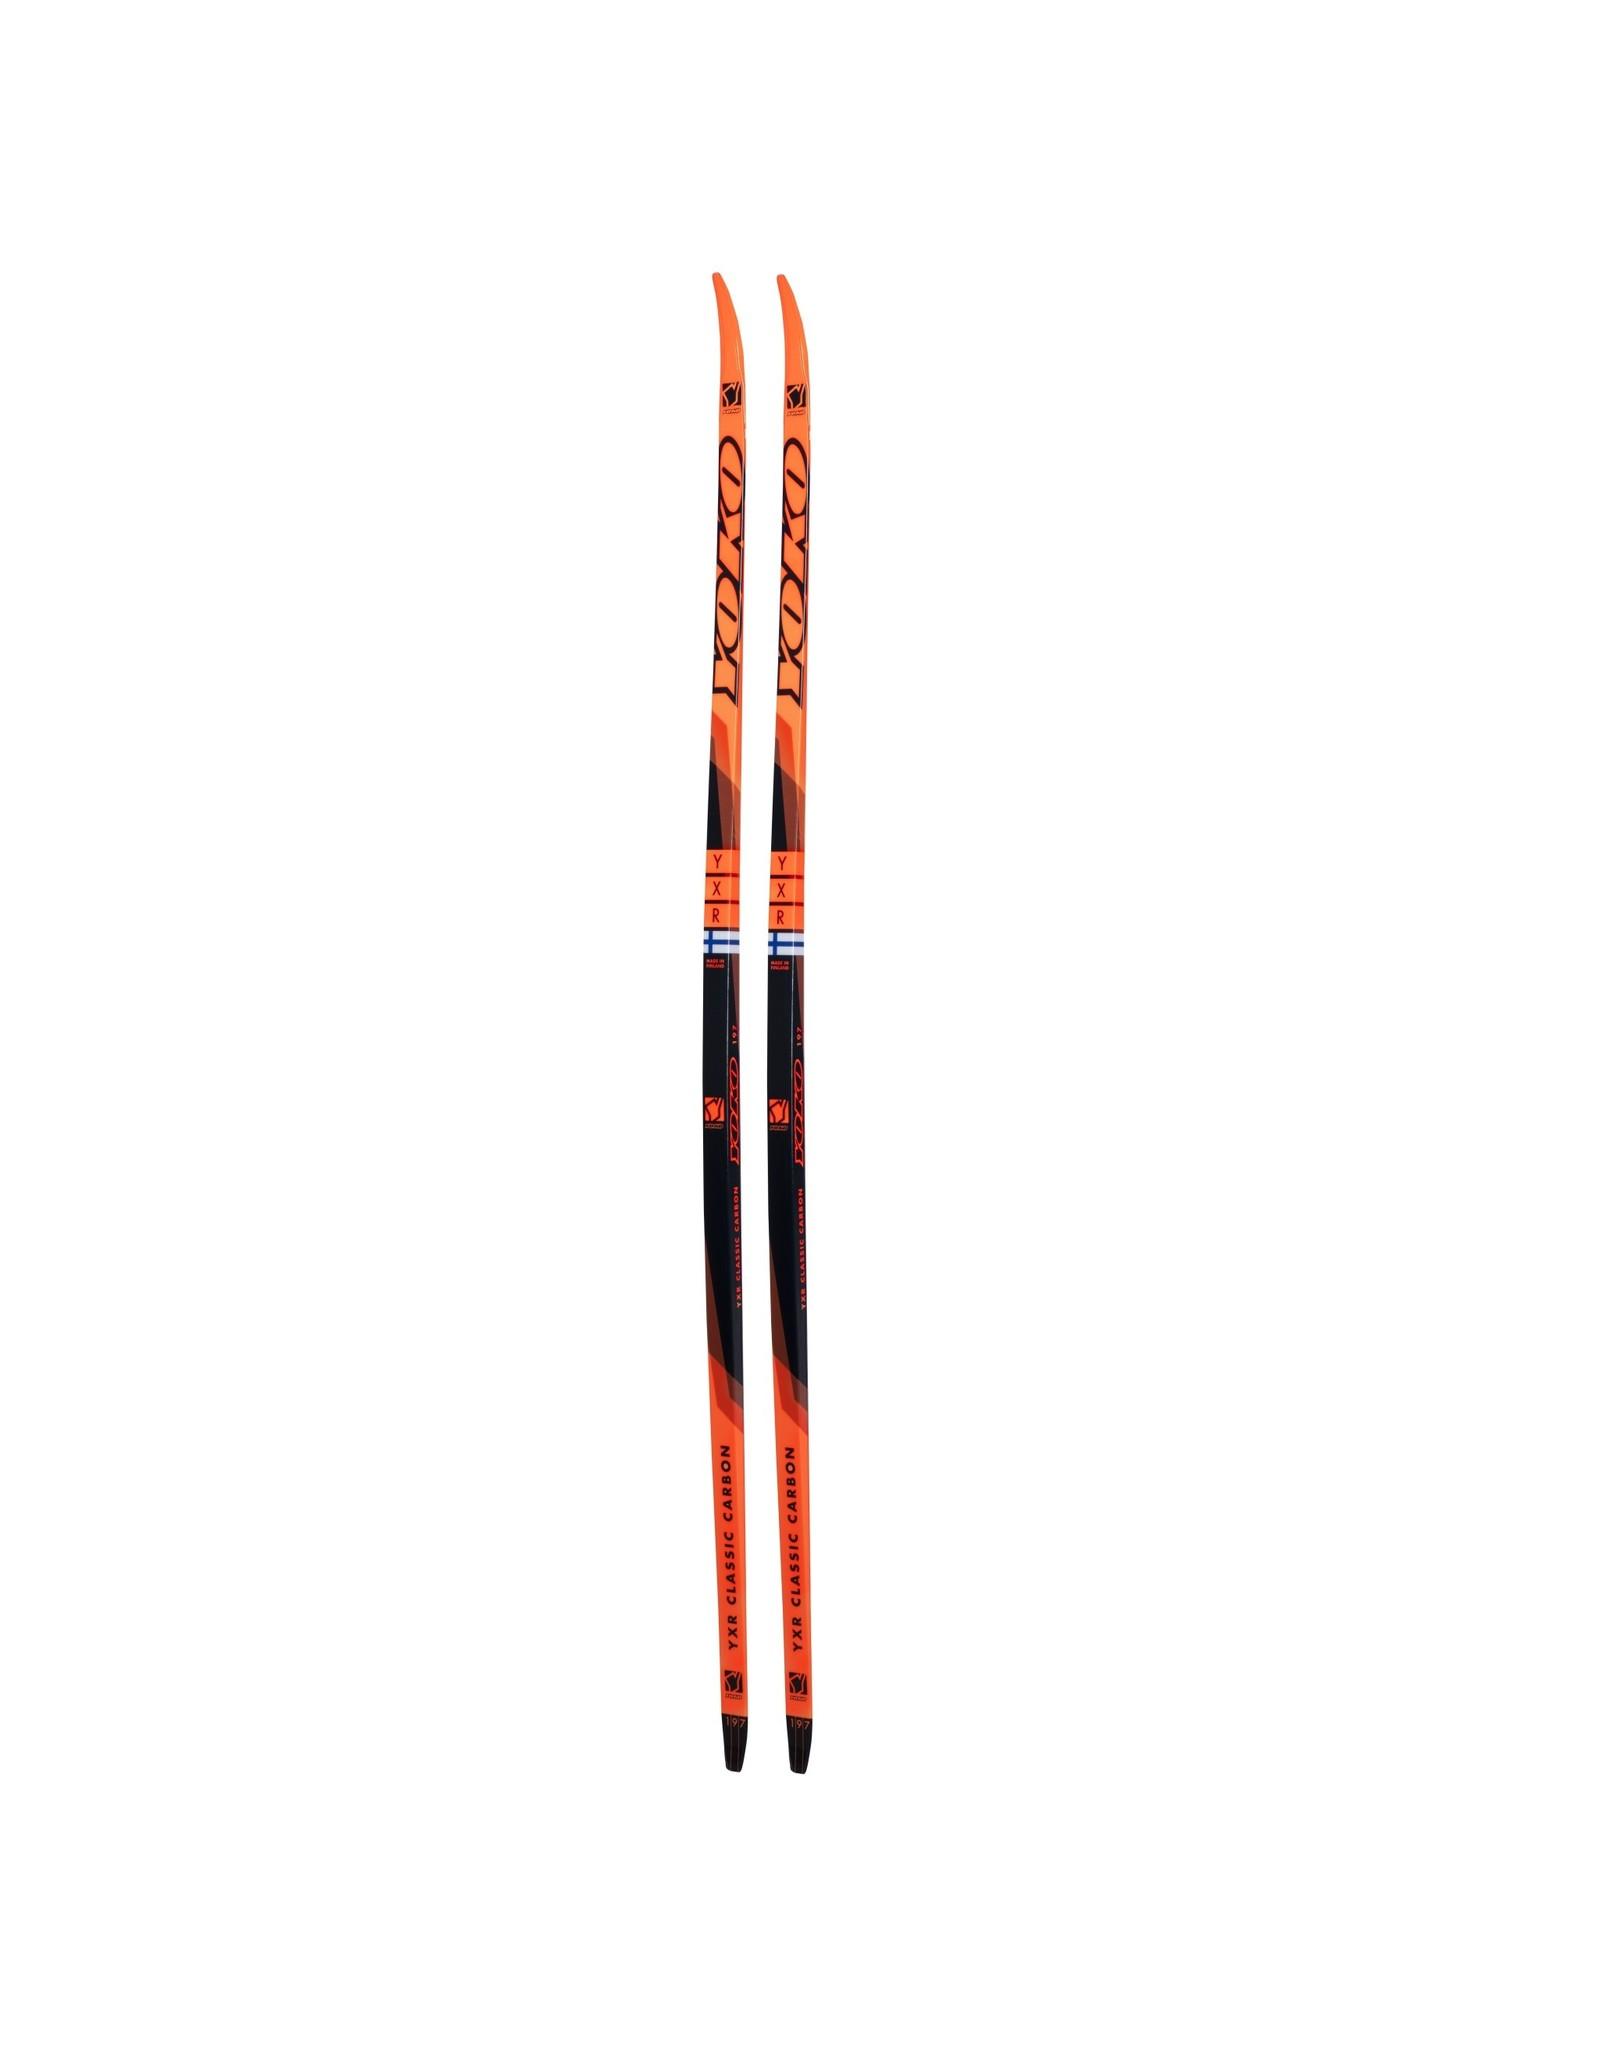 Yoko Yoko YXR Classic Carbon BTP Wet Ski